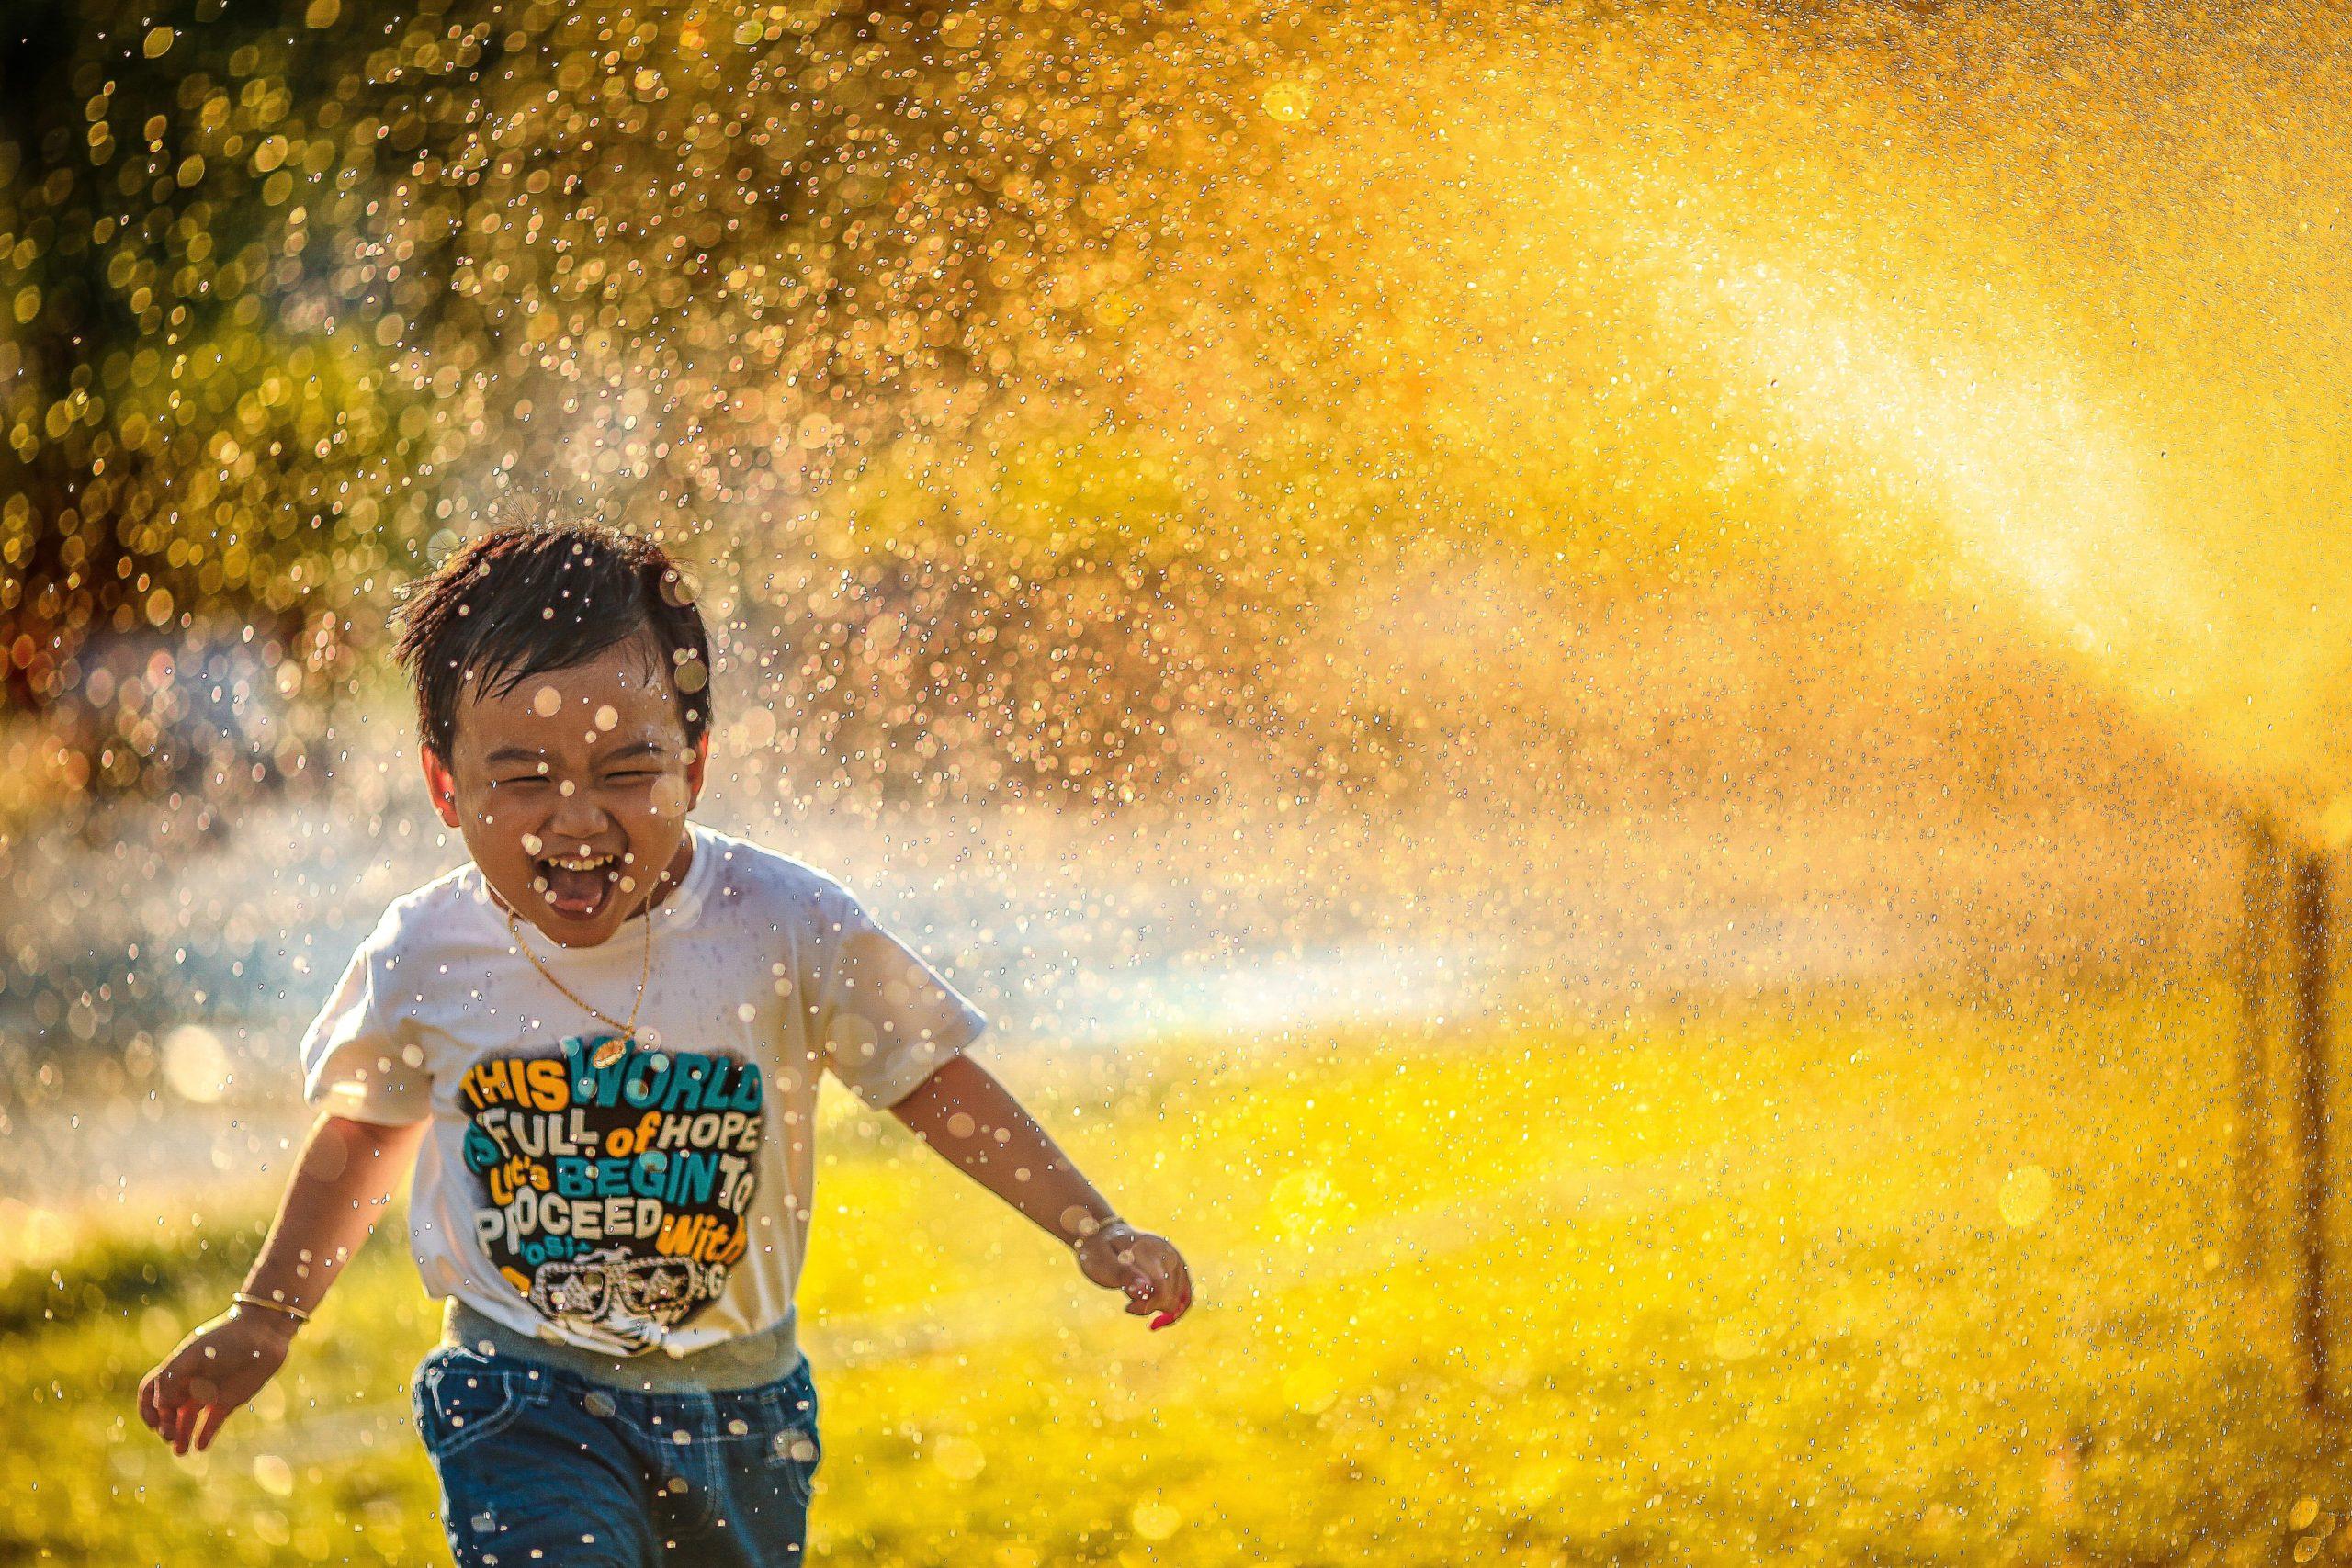 Hindi poetry on childhood life - अजूबी बचपन> अर्चना की रचना